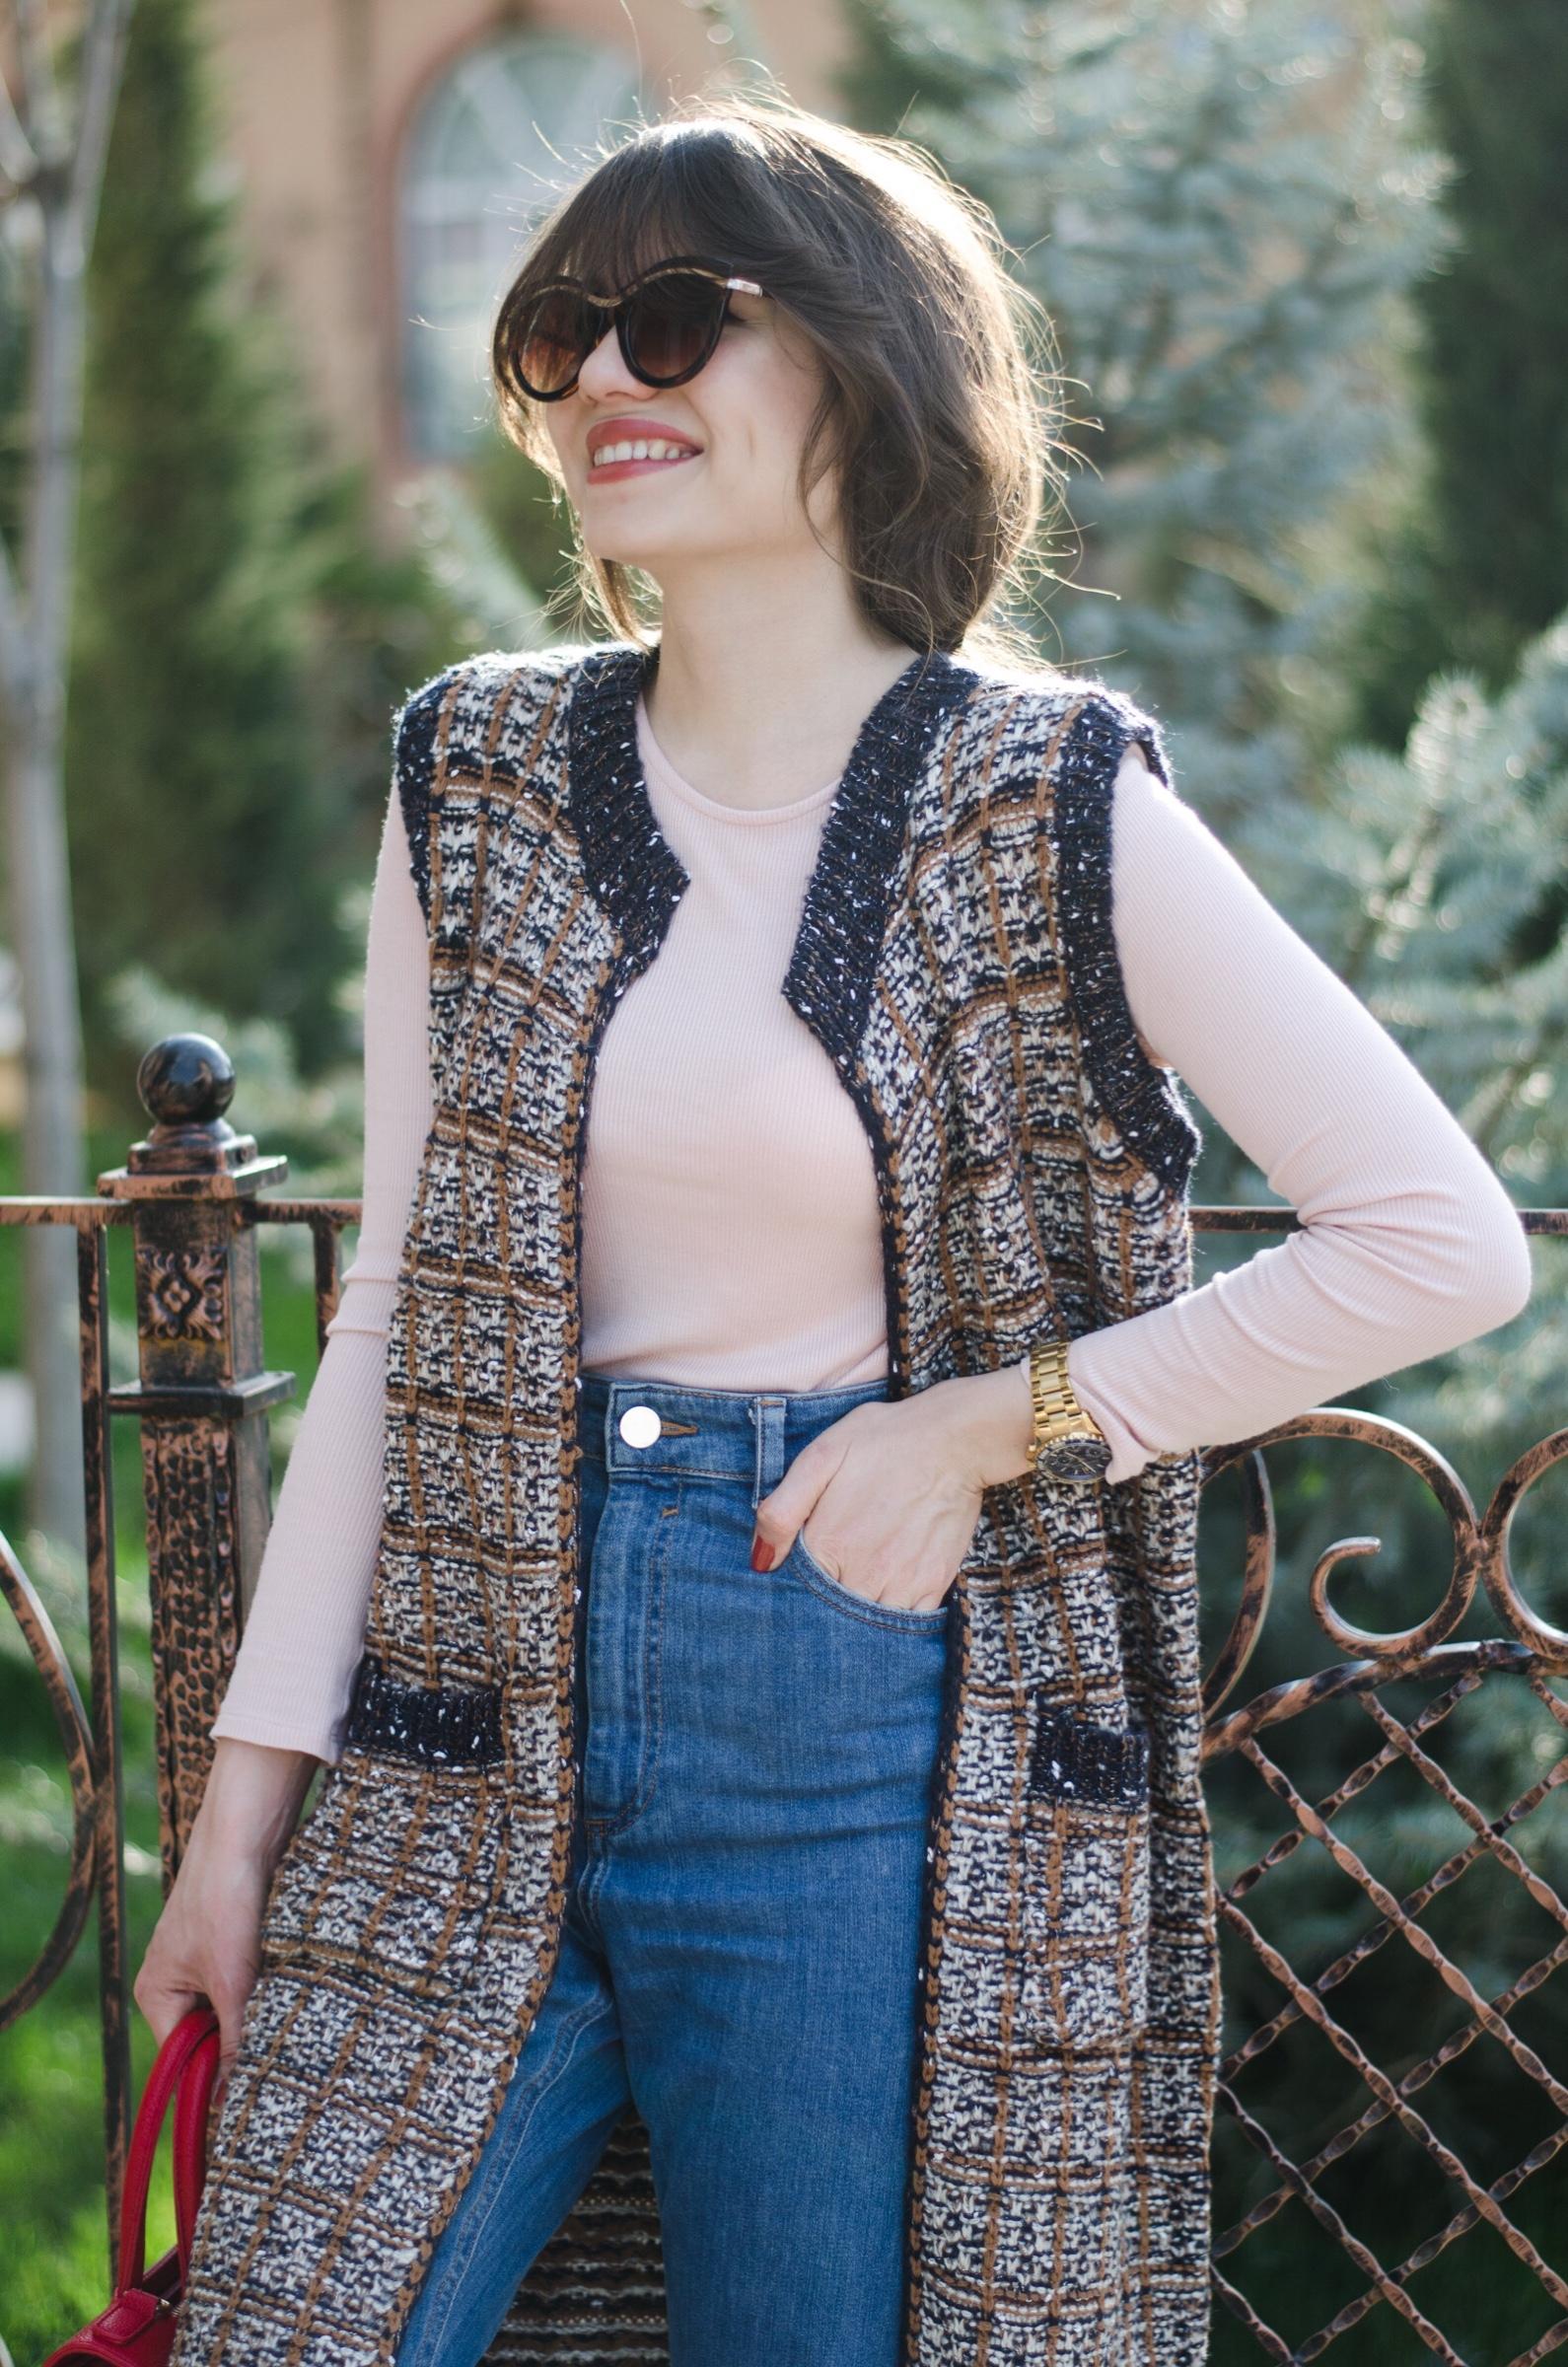 fashion blogger diyorasnotes diyora beta knitted vest mom jeans asos sneakers red bag